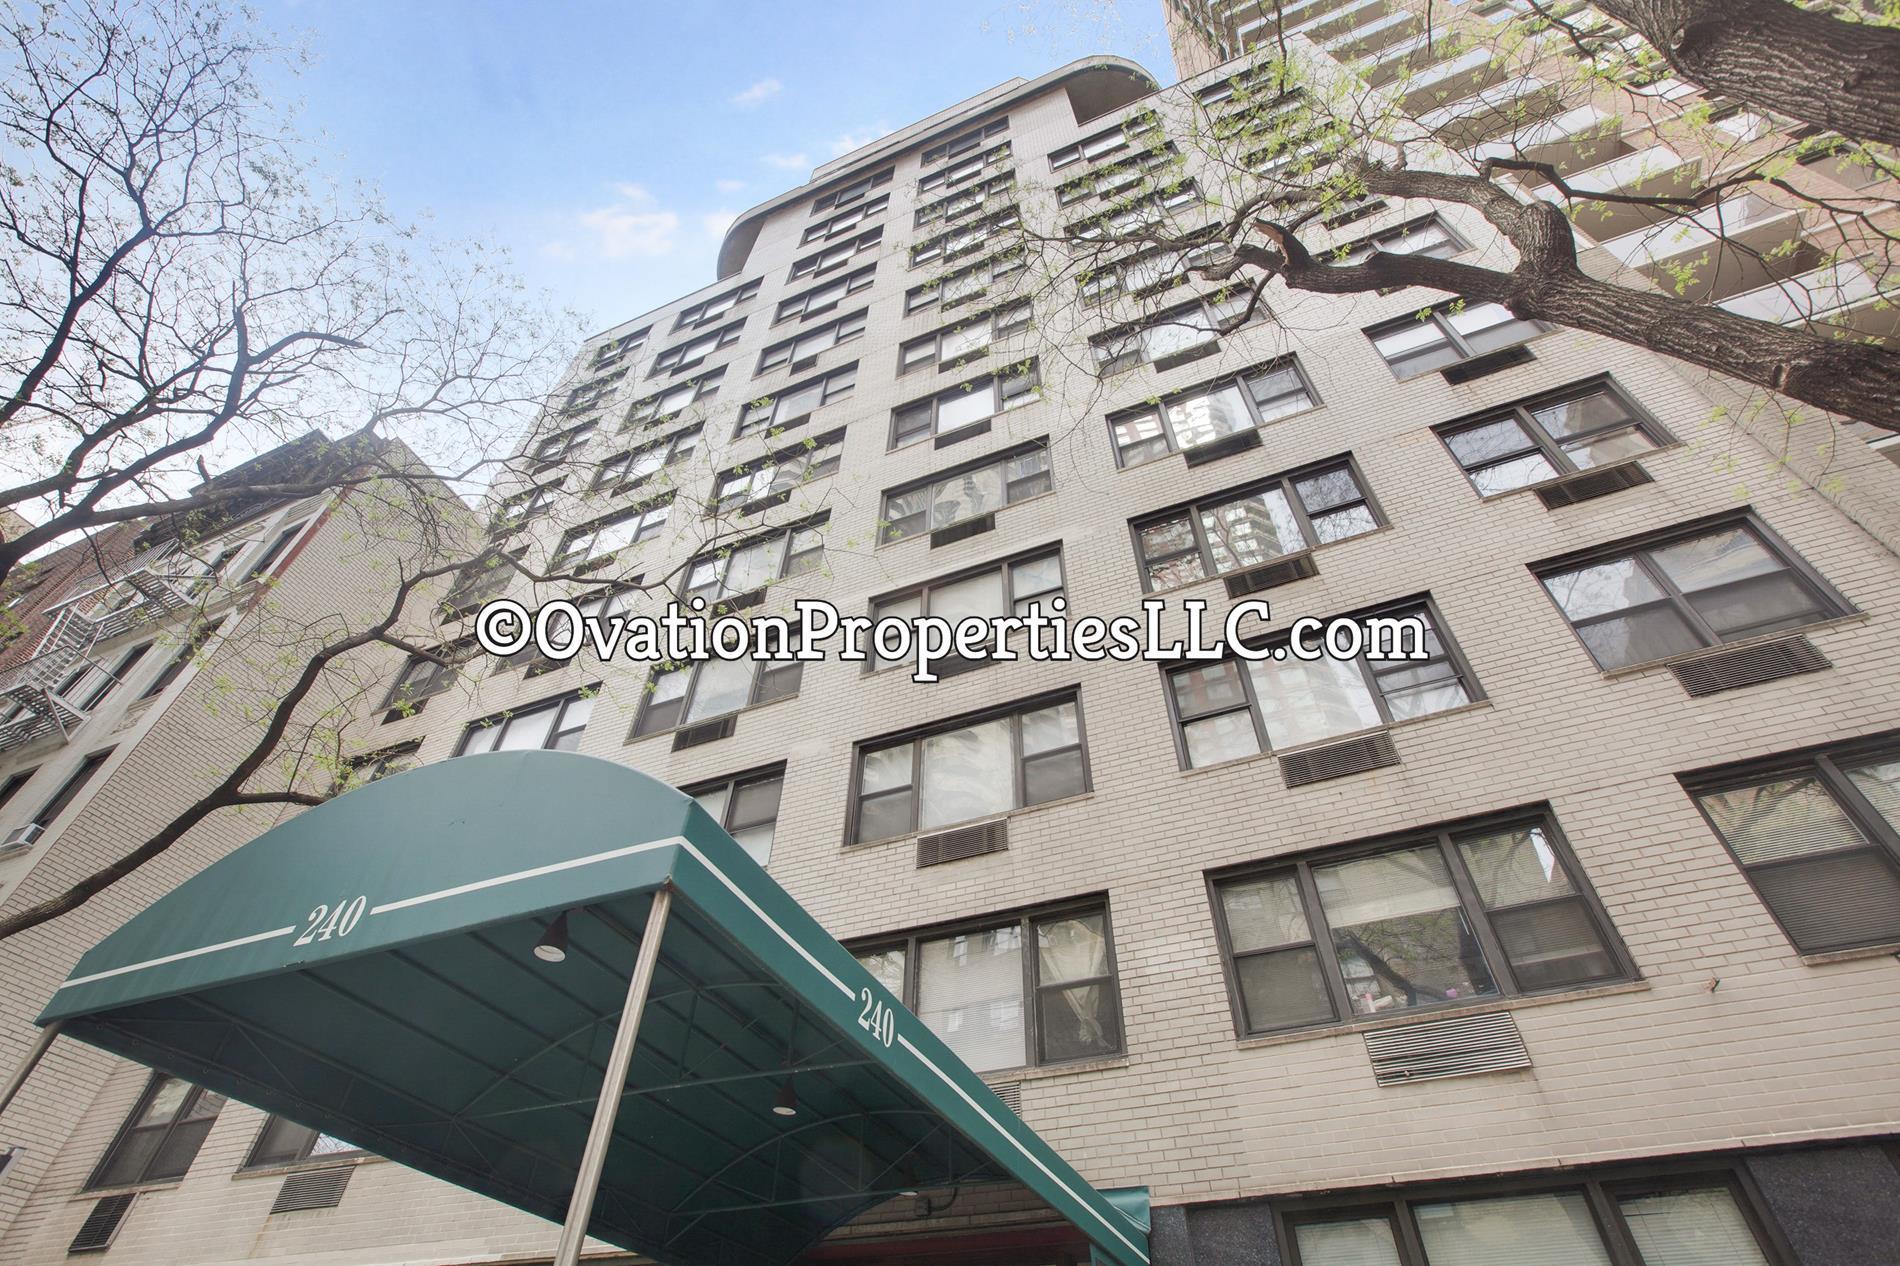 240 East 46th Street Turtle Bay New York NY 10017